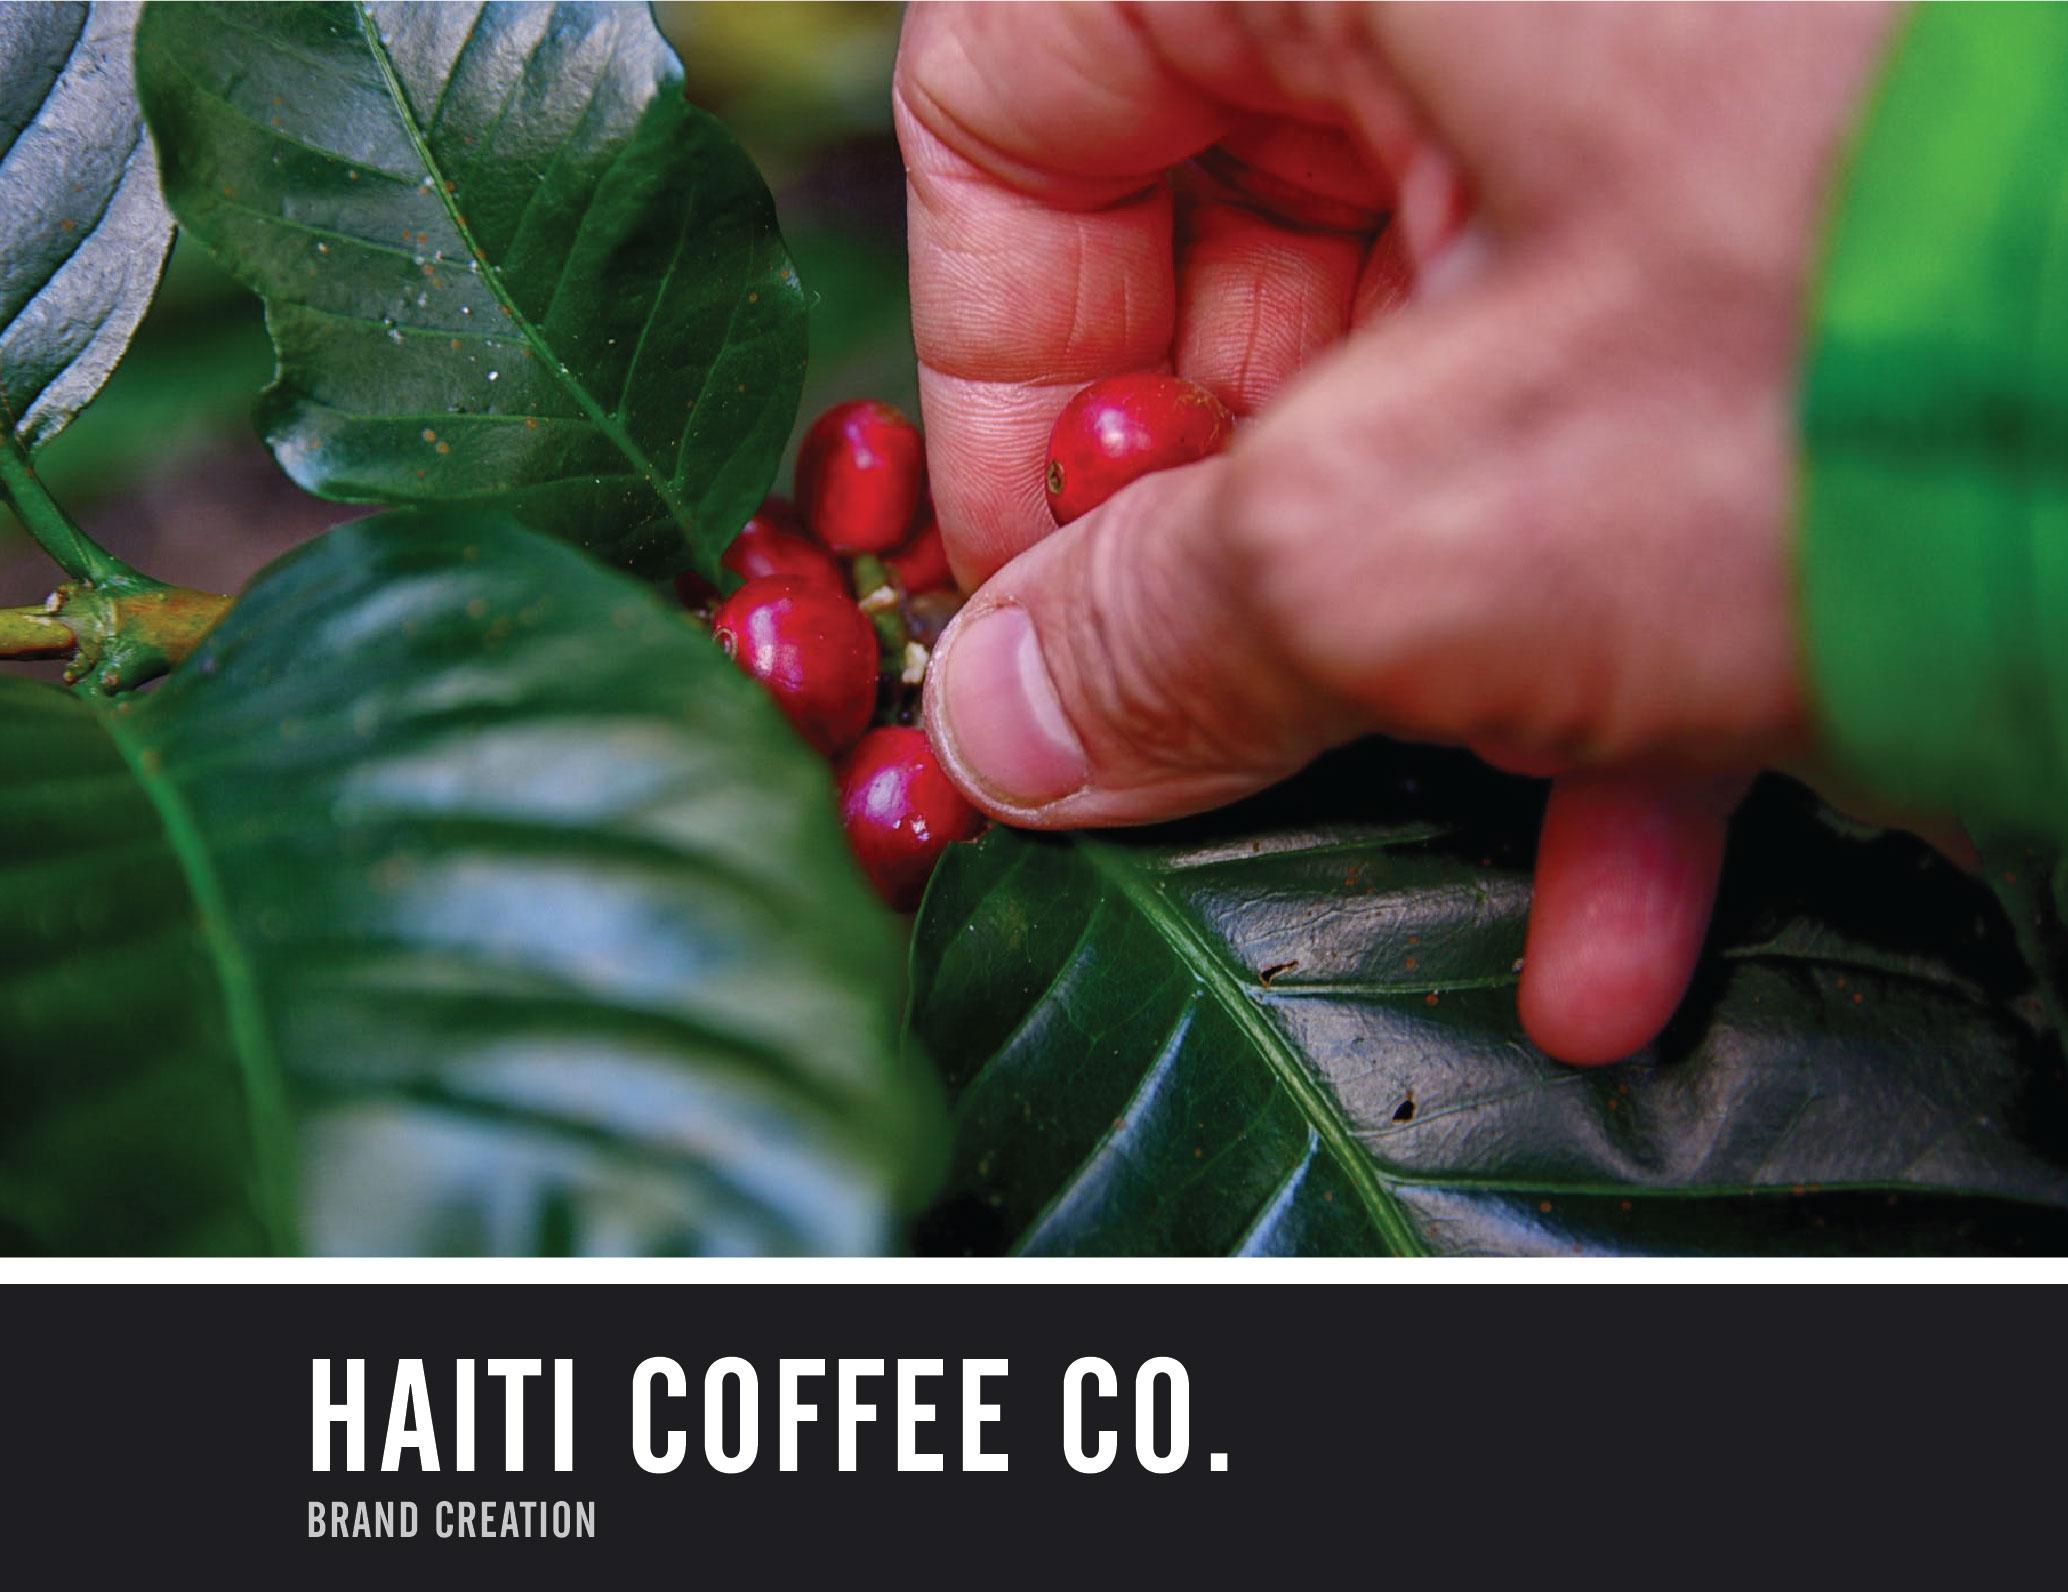 HaitiCoffeeCo_splashpg-01.jpg